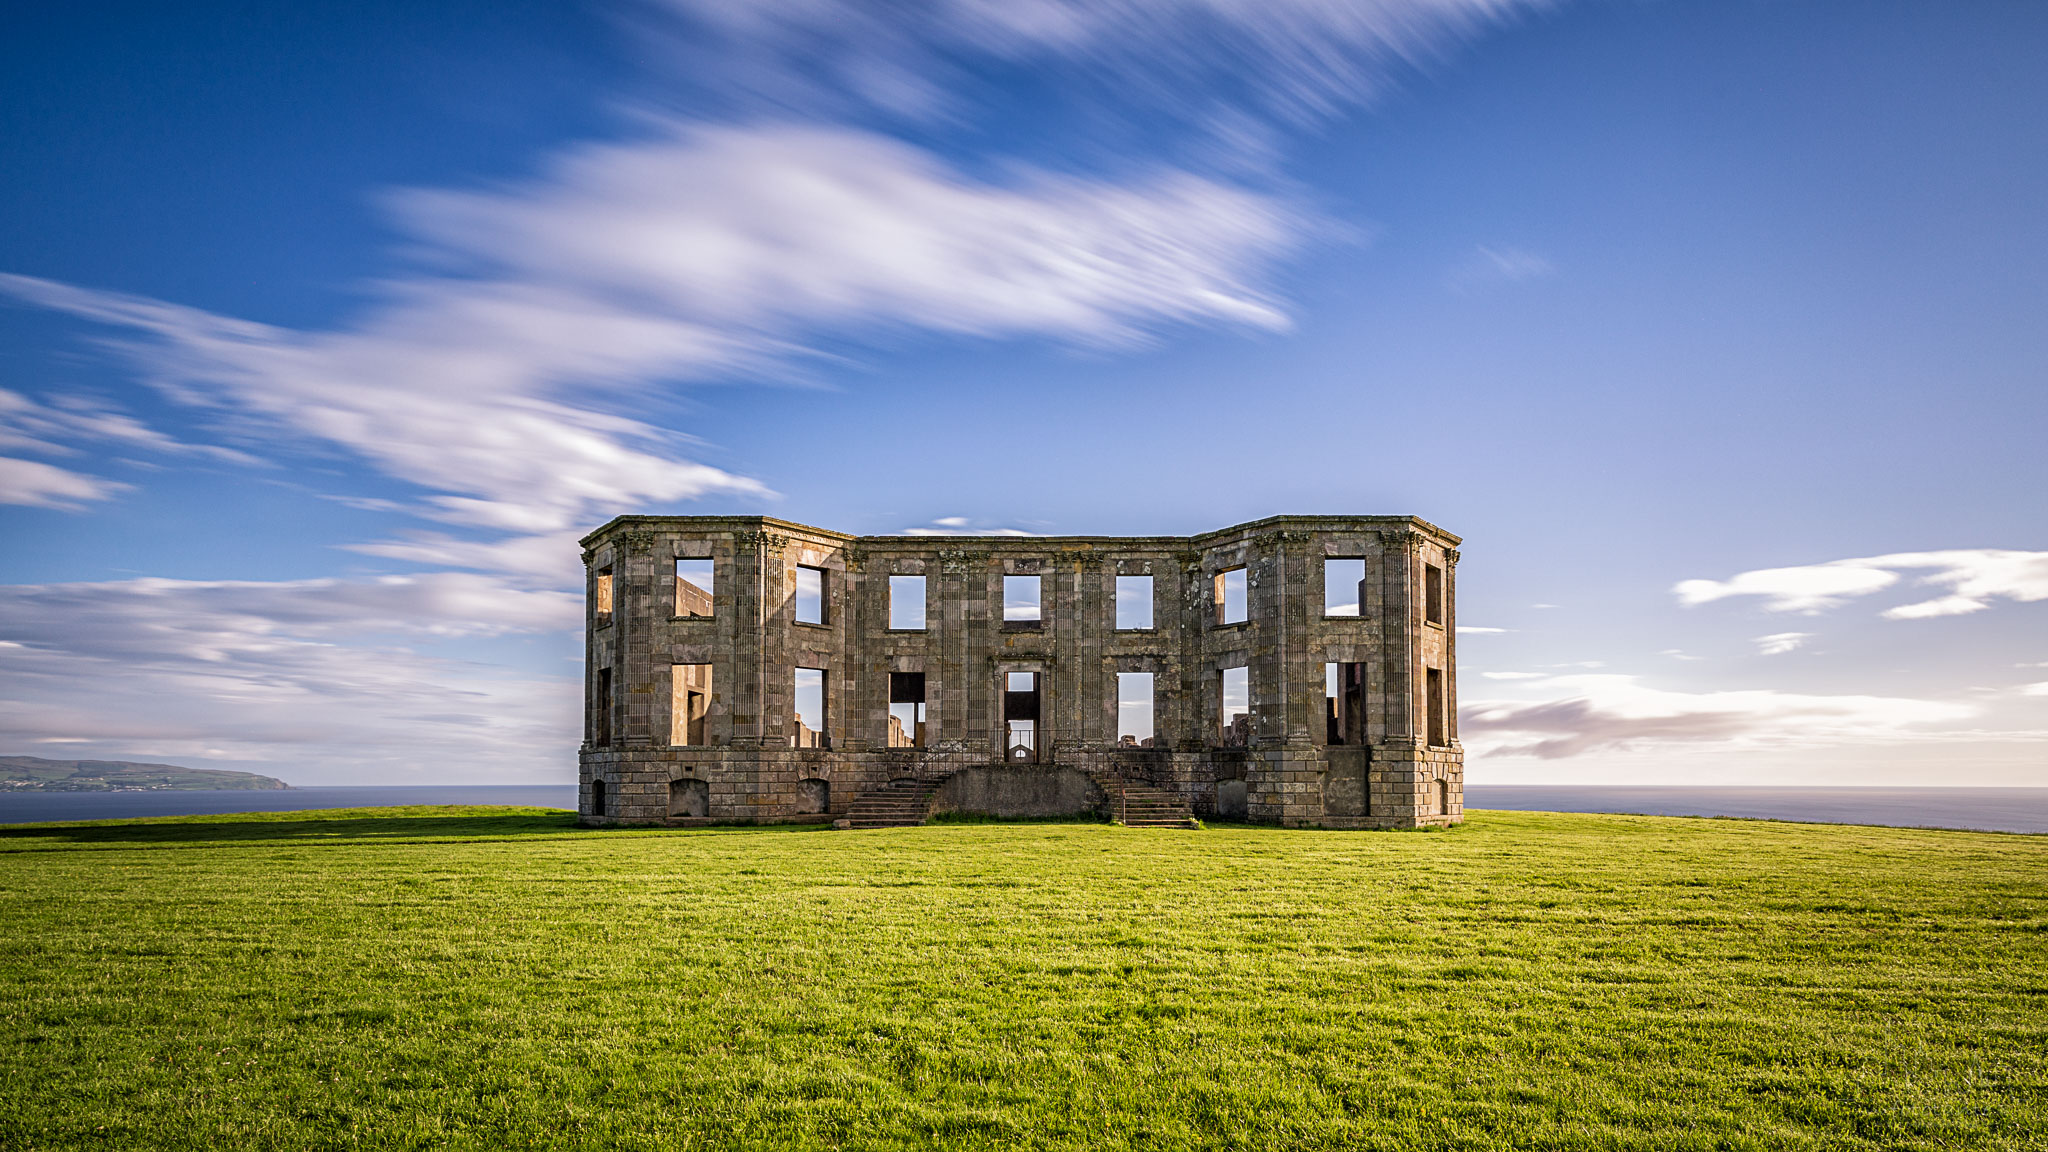 Downhill Demesne ruin, United Kingdom